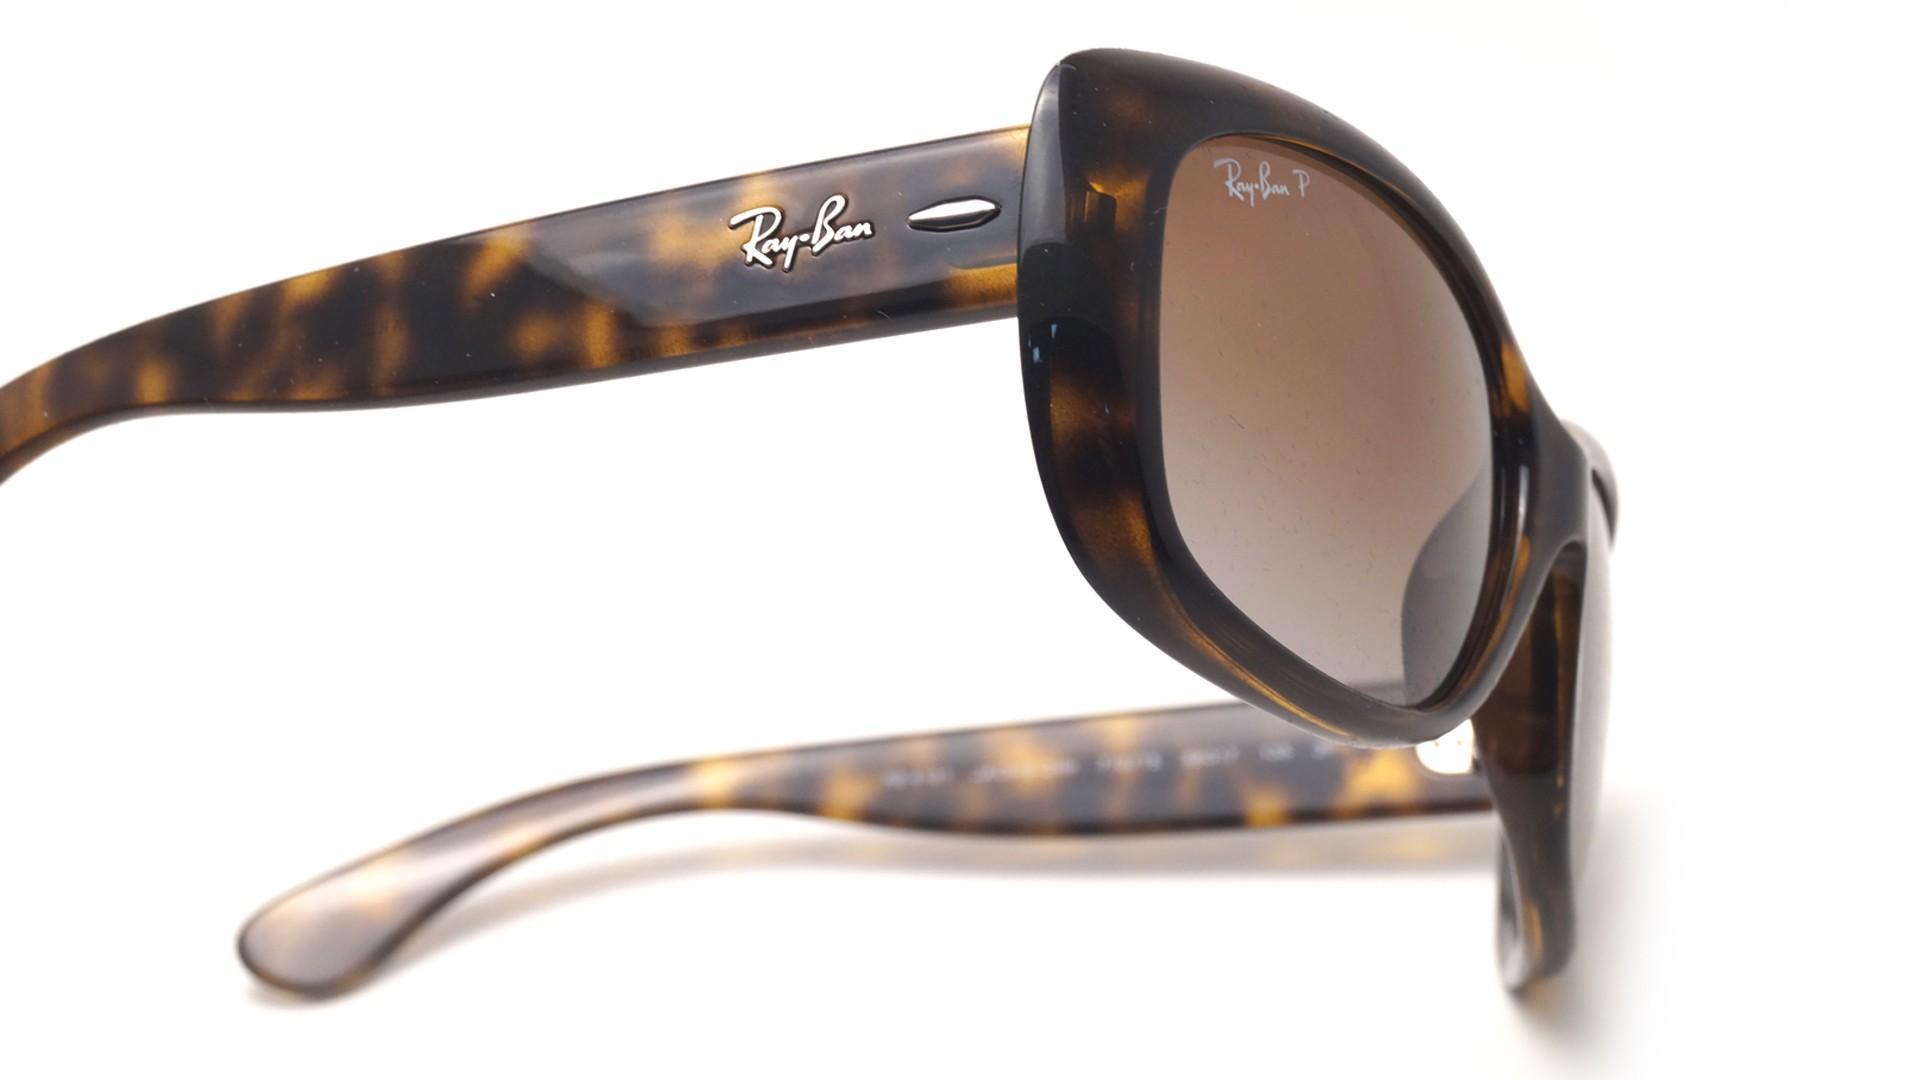 fa702231b01 Sunglasses Ray-Ban Jackie Ohh Tortoise RB4101 710 T5 58-17 Large Polarized  Gradient